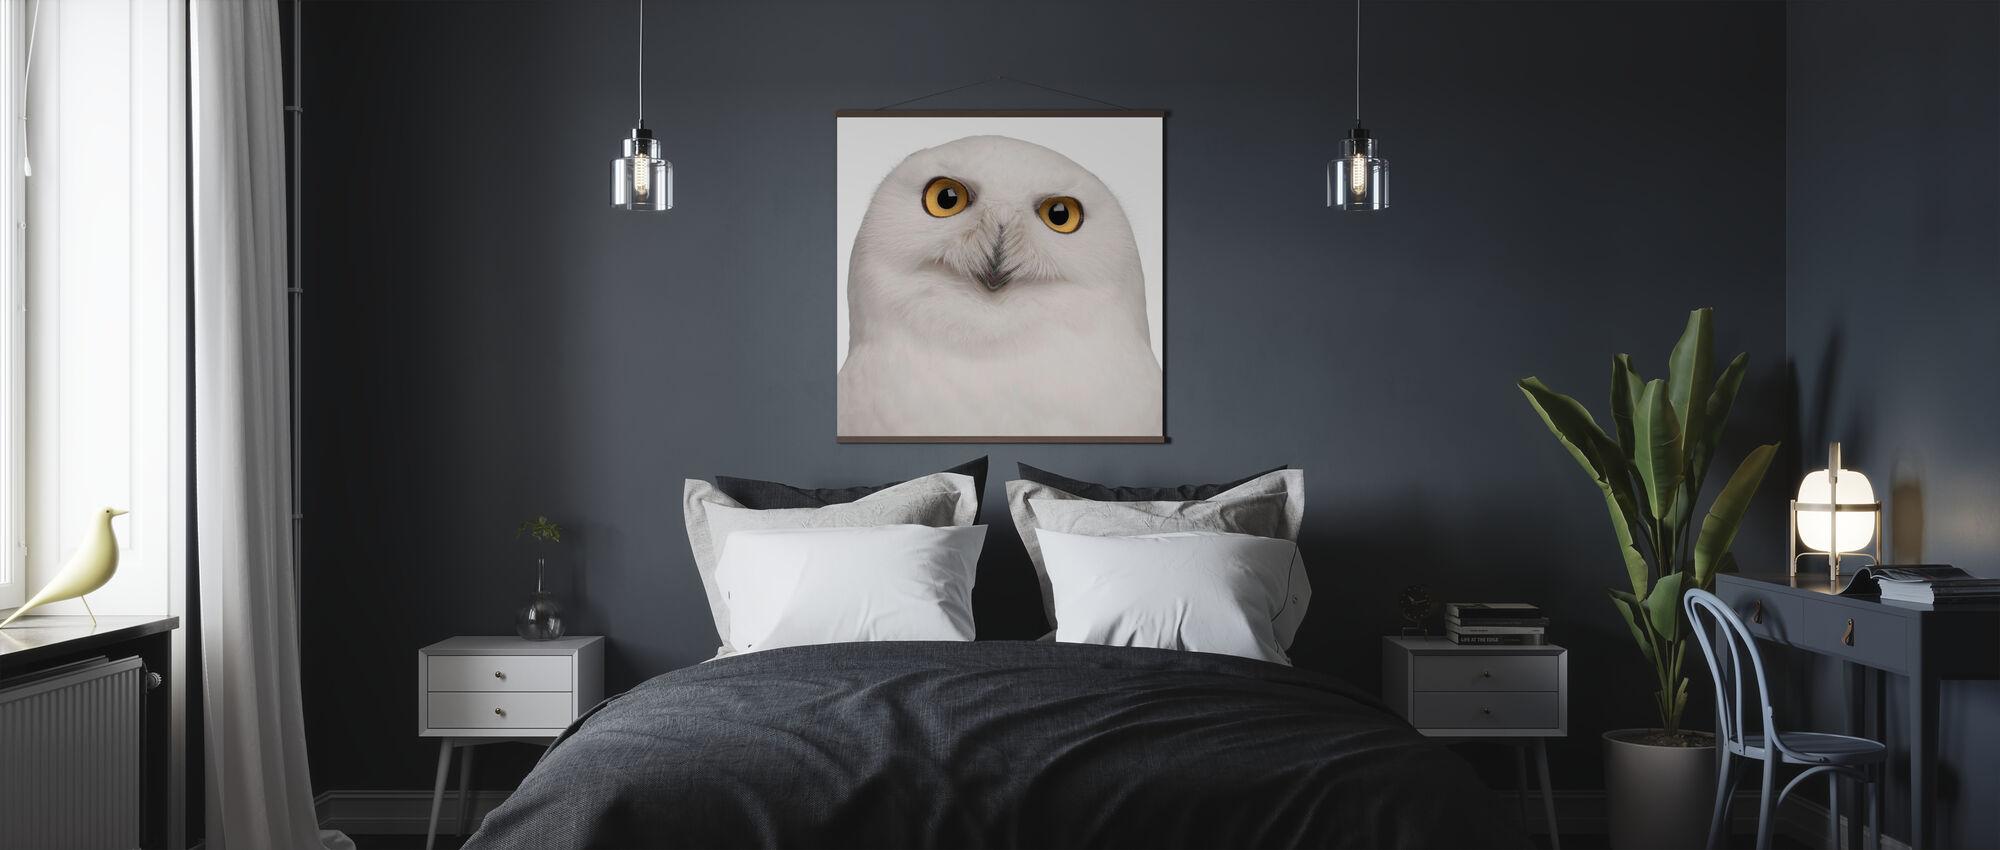 Sneeuwuil - Poster - Slaapkamer